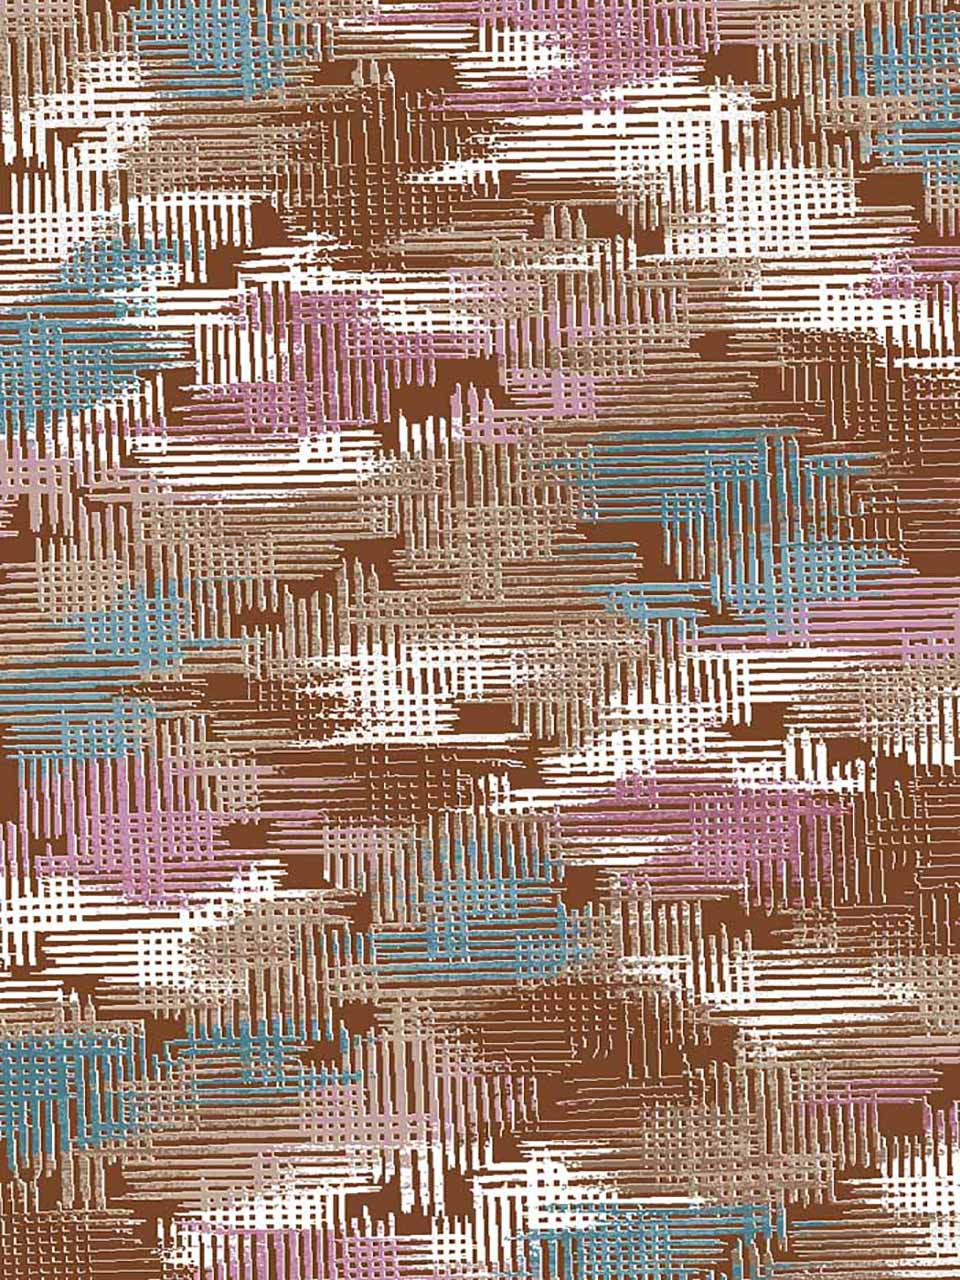 فرش (7031) پلی پرو پیلن - 8 رنگ - 410 شانه - قهوه ای - تراکم 1000